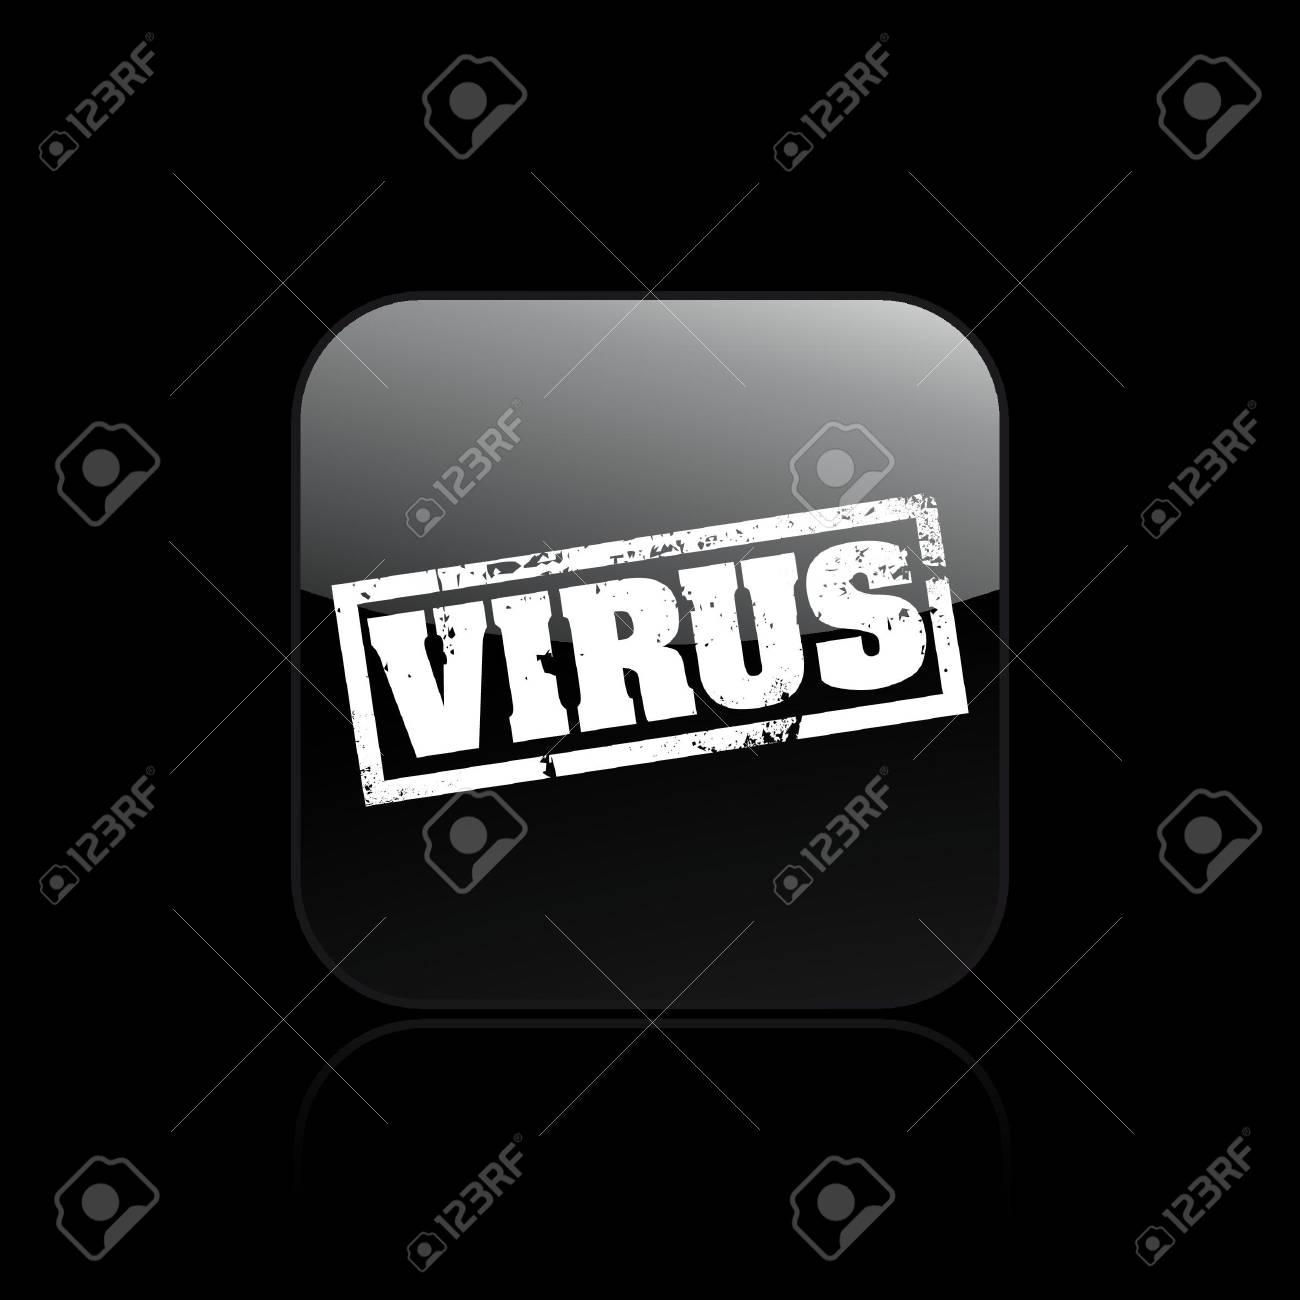 Vector illustration of single isolated virus icon Stock Vector - 12129607